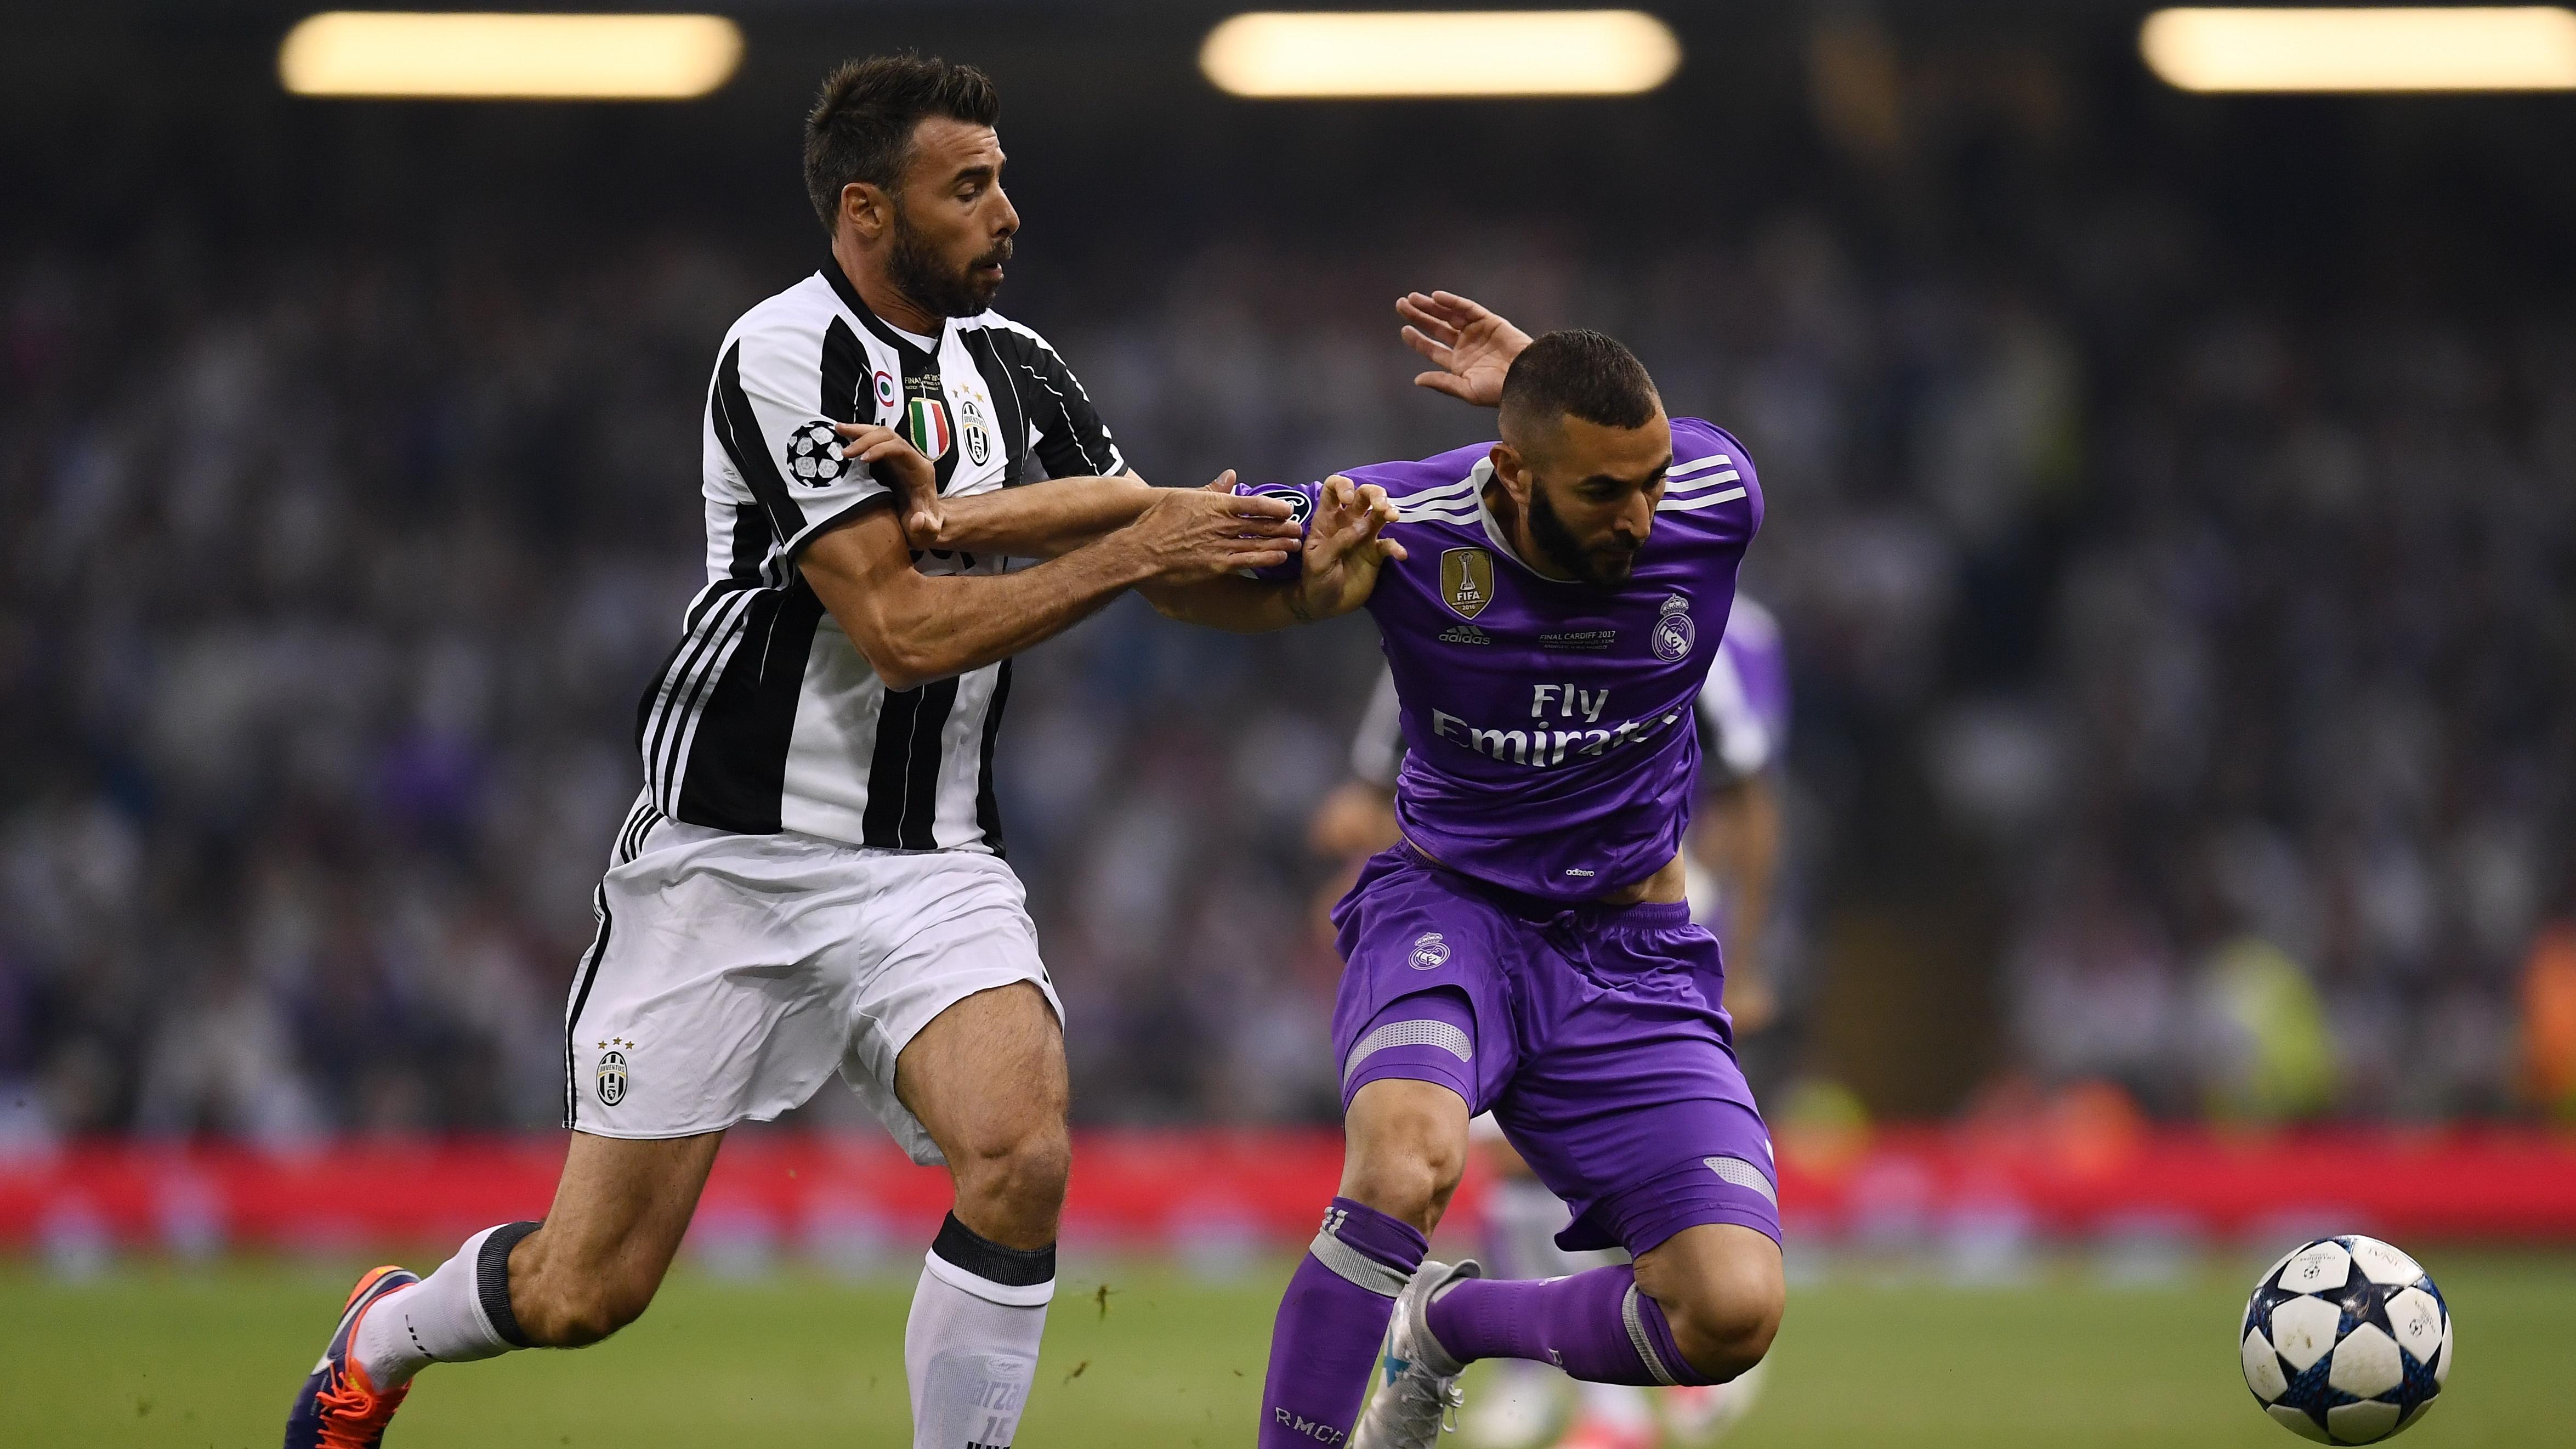 Paulo Dybala Juventus Casemiro Real Madrid Champions League